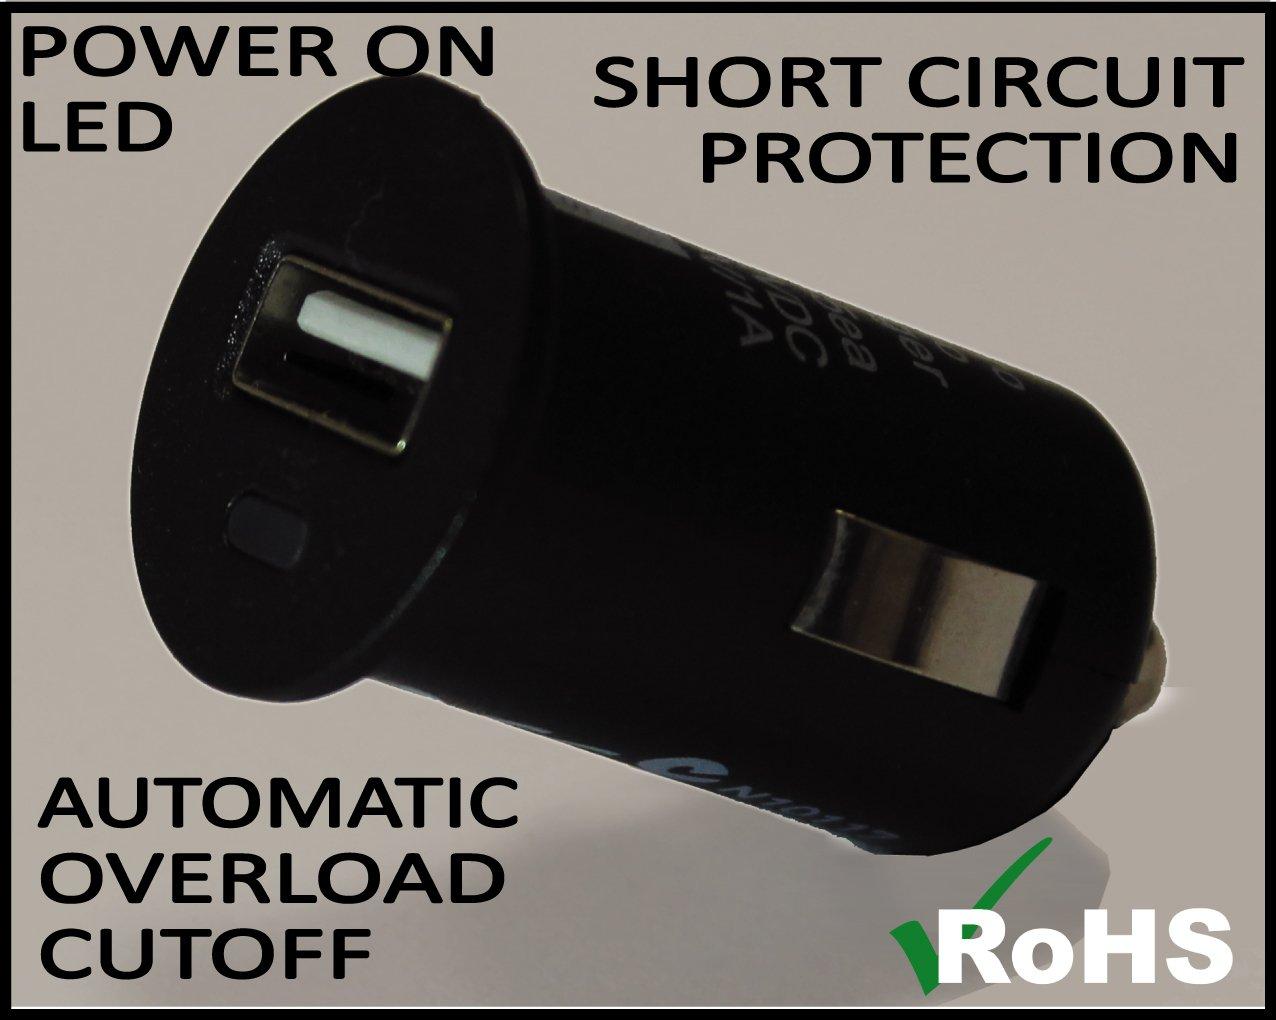 BC Battery Controller 710-P12USB Prise 12V Allume Cigare /Étanche avec Support Universel au Guidon pour Moto Chargeur//Adapteur USB Extractible